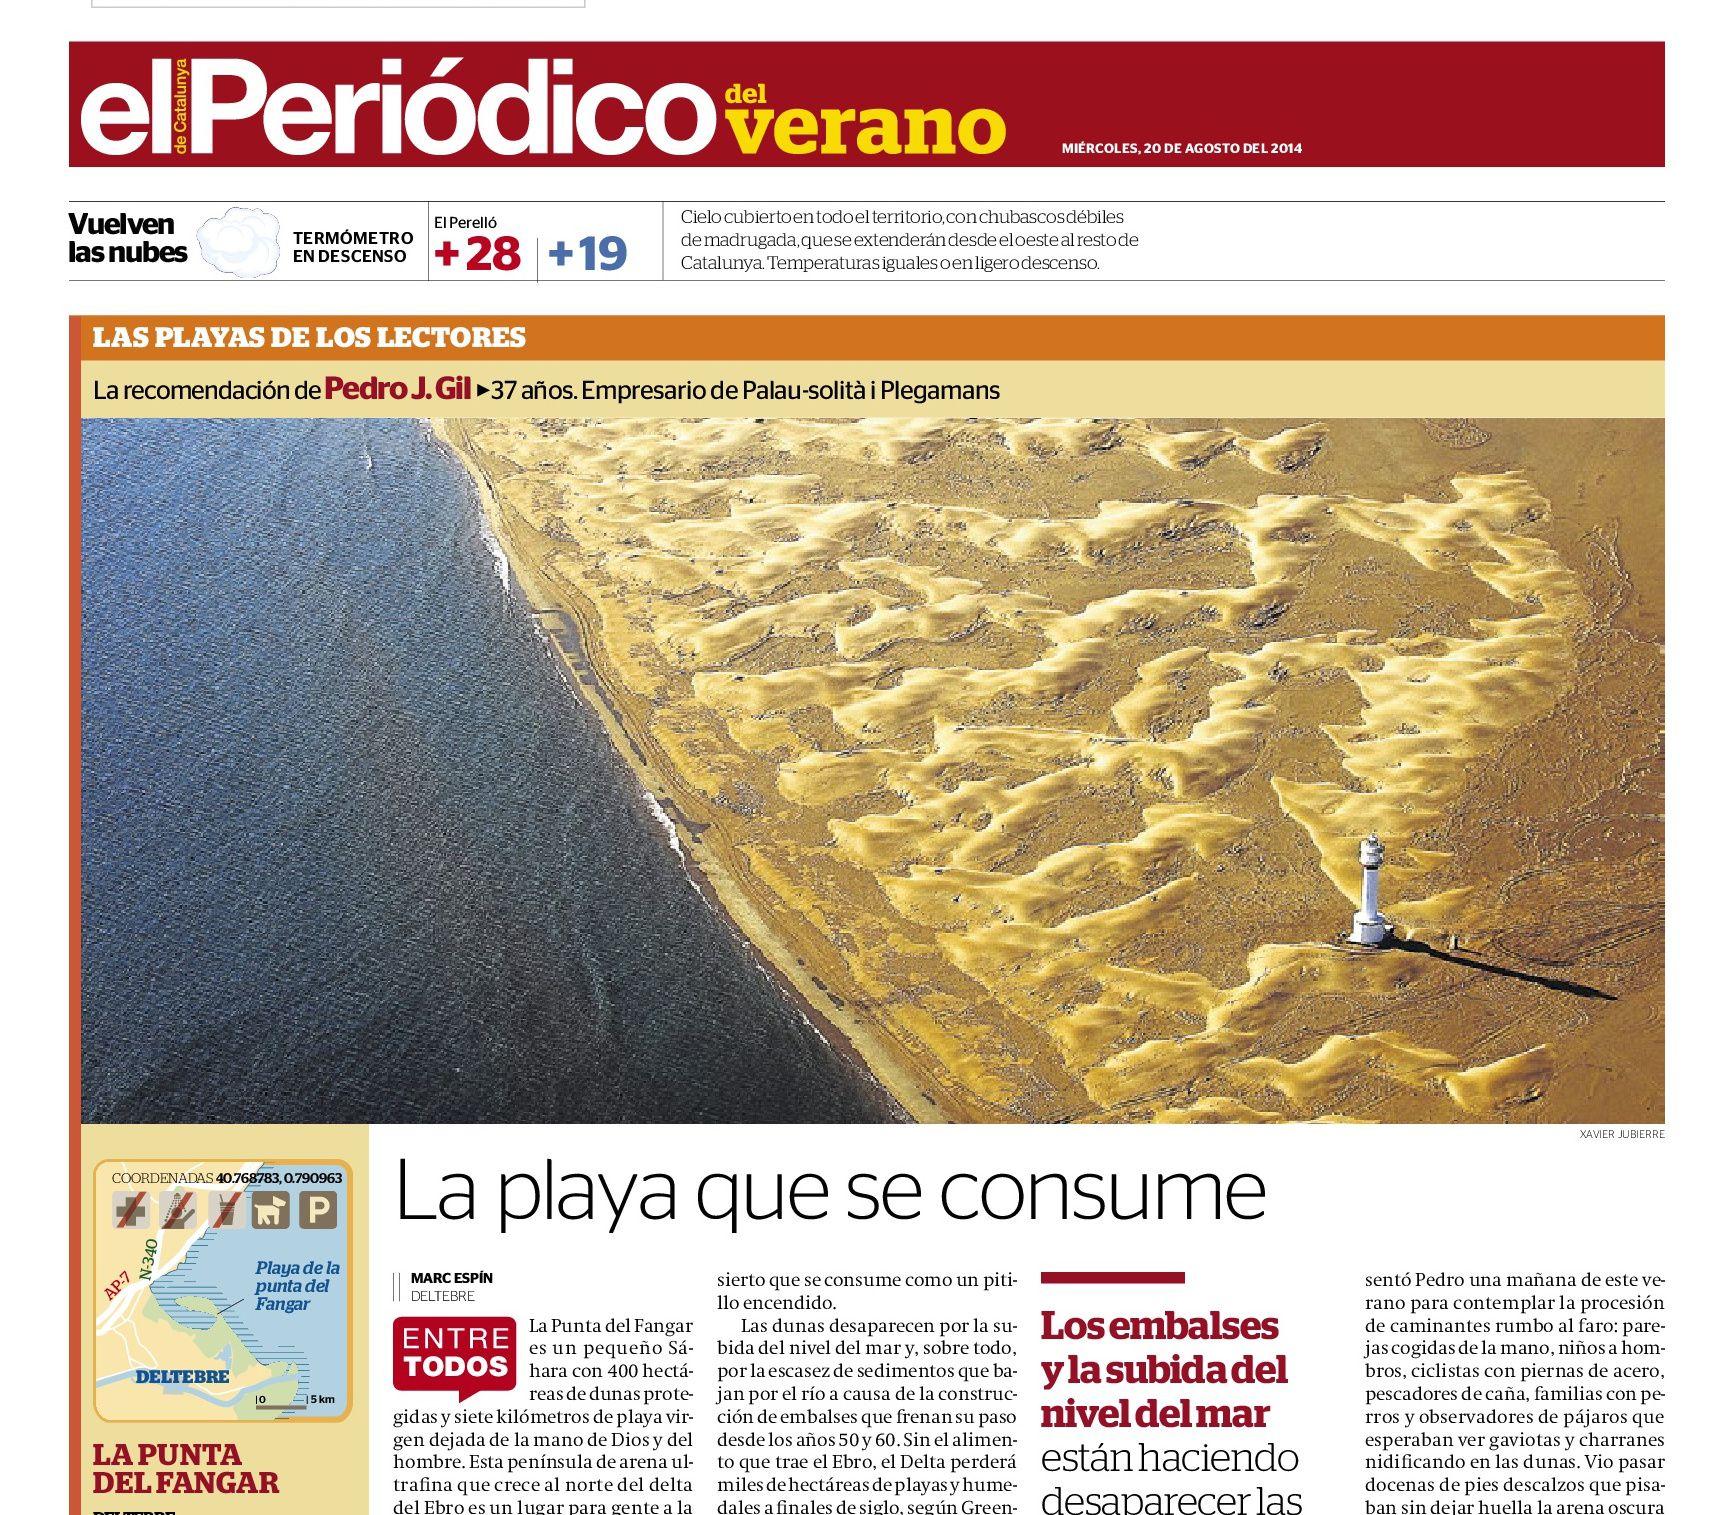 La Punta del Fangar, Deltebre | La playa que se consume